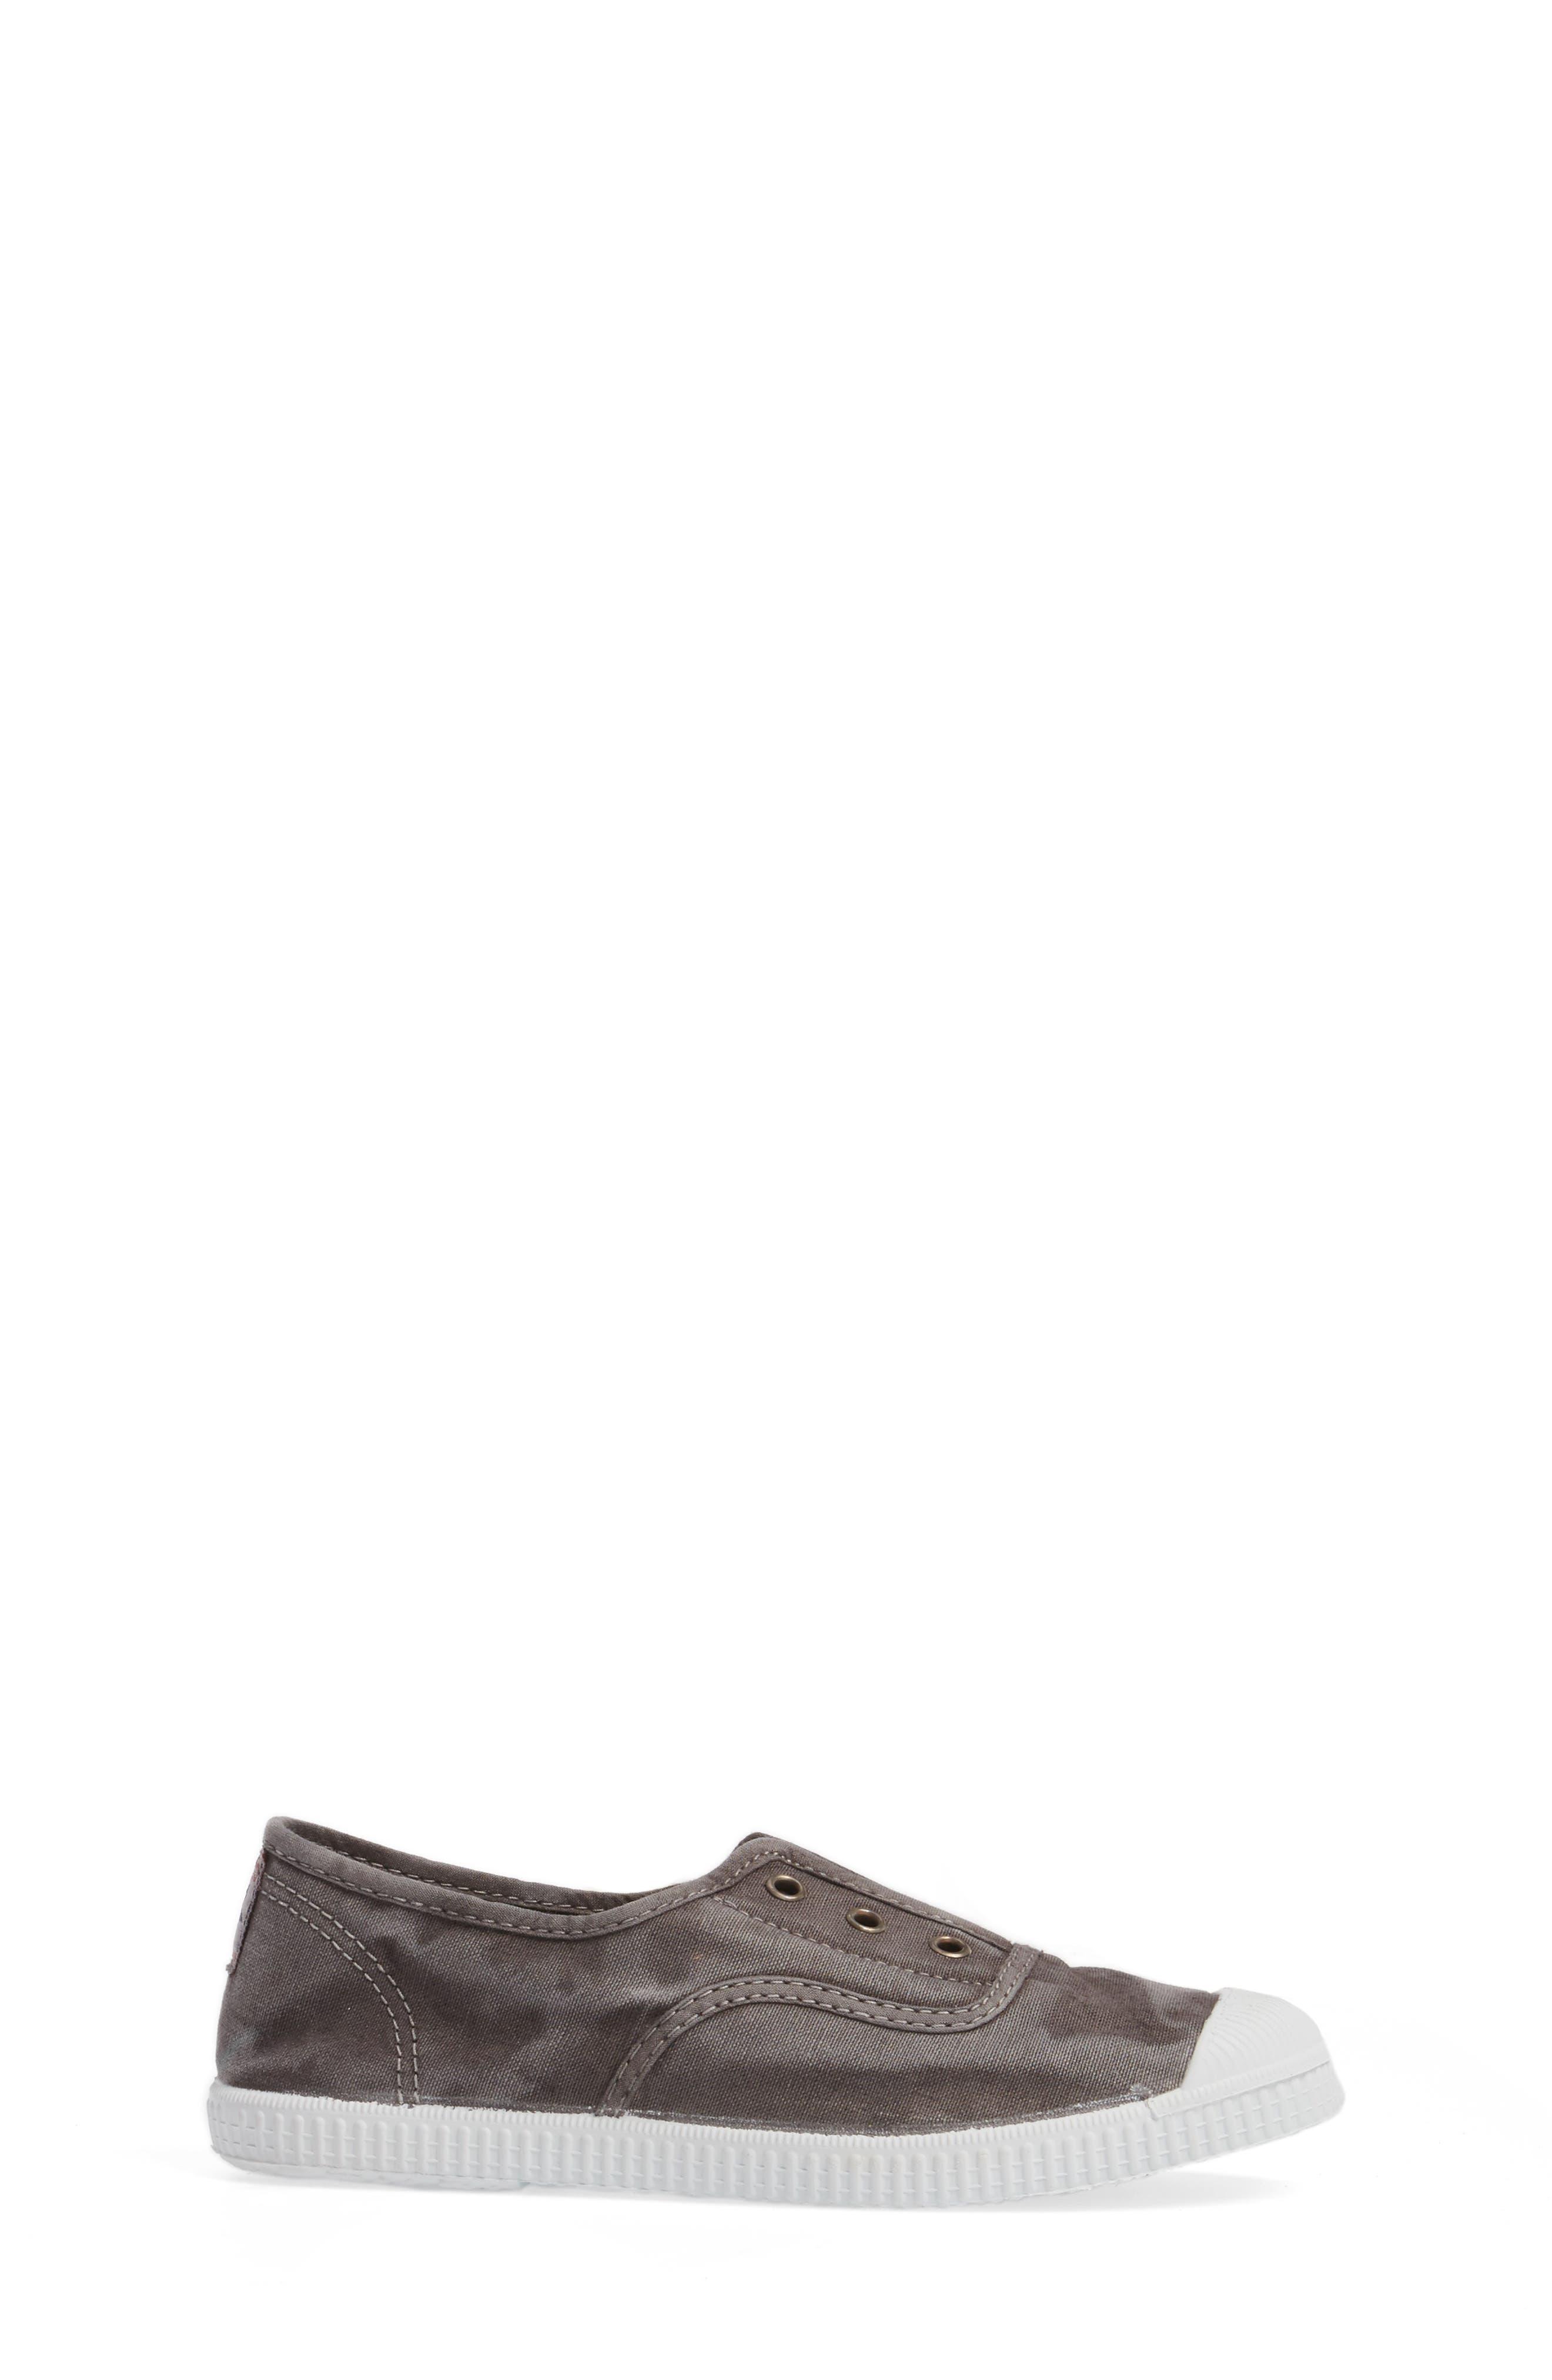 Alternate Image 3  - Cienta Laceless Slip-On Sneaker (Walker, Toddler, Little Kid & Big Kid)